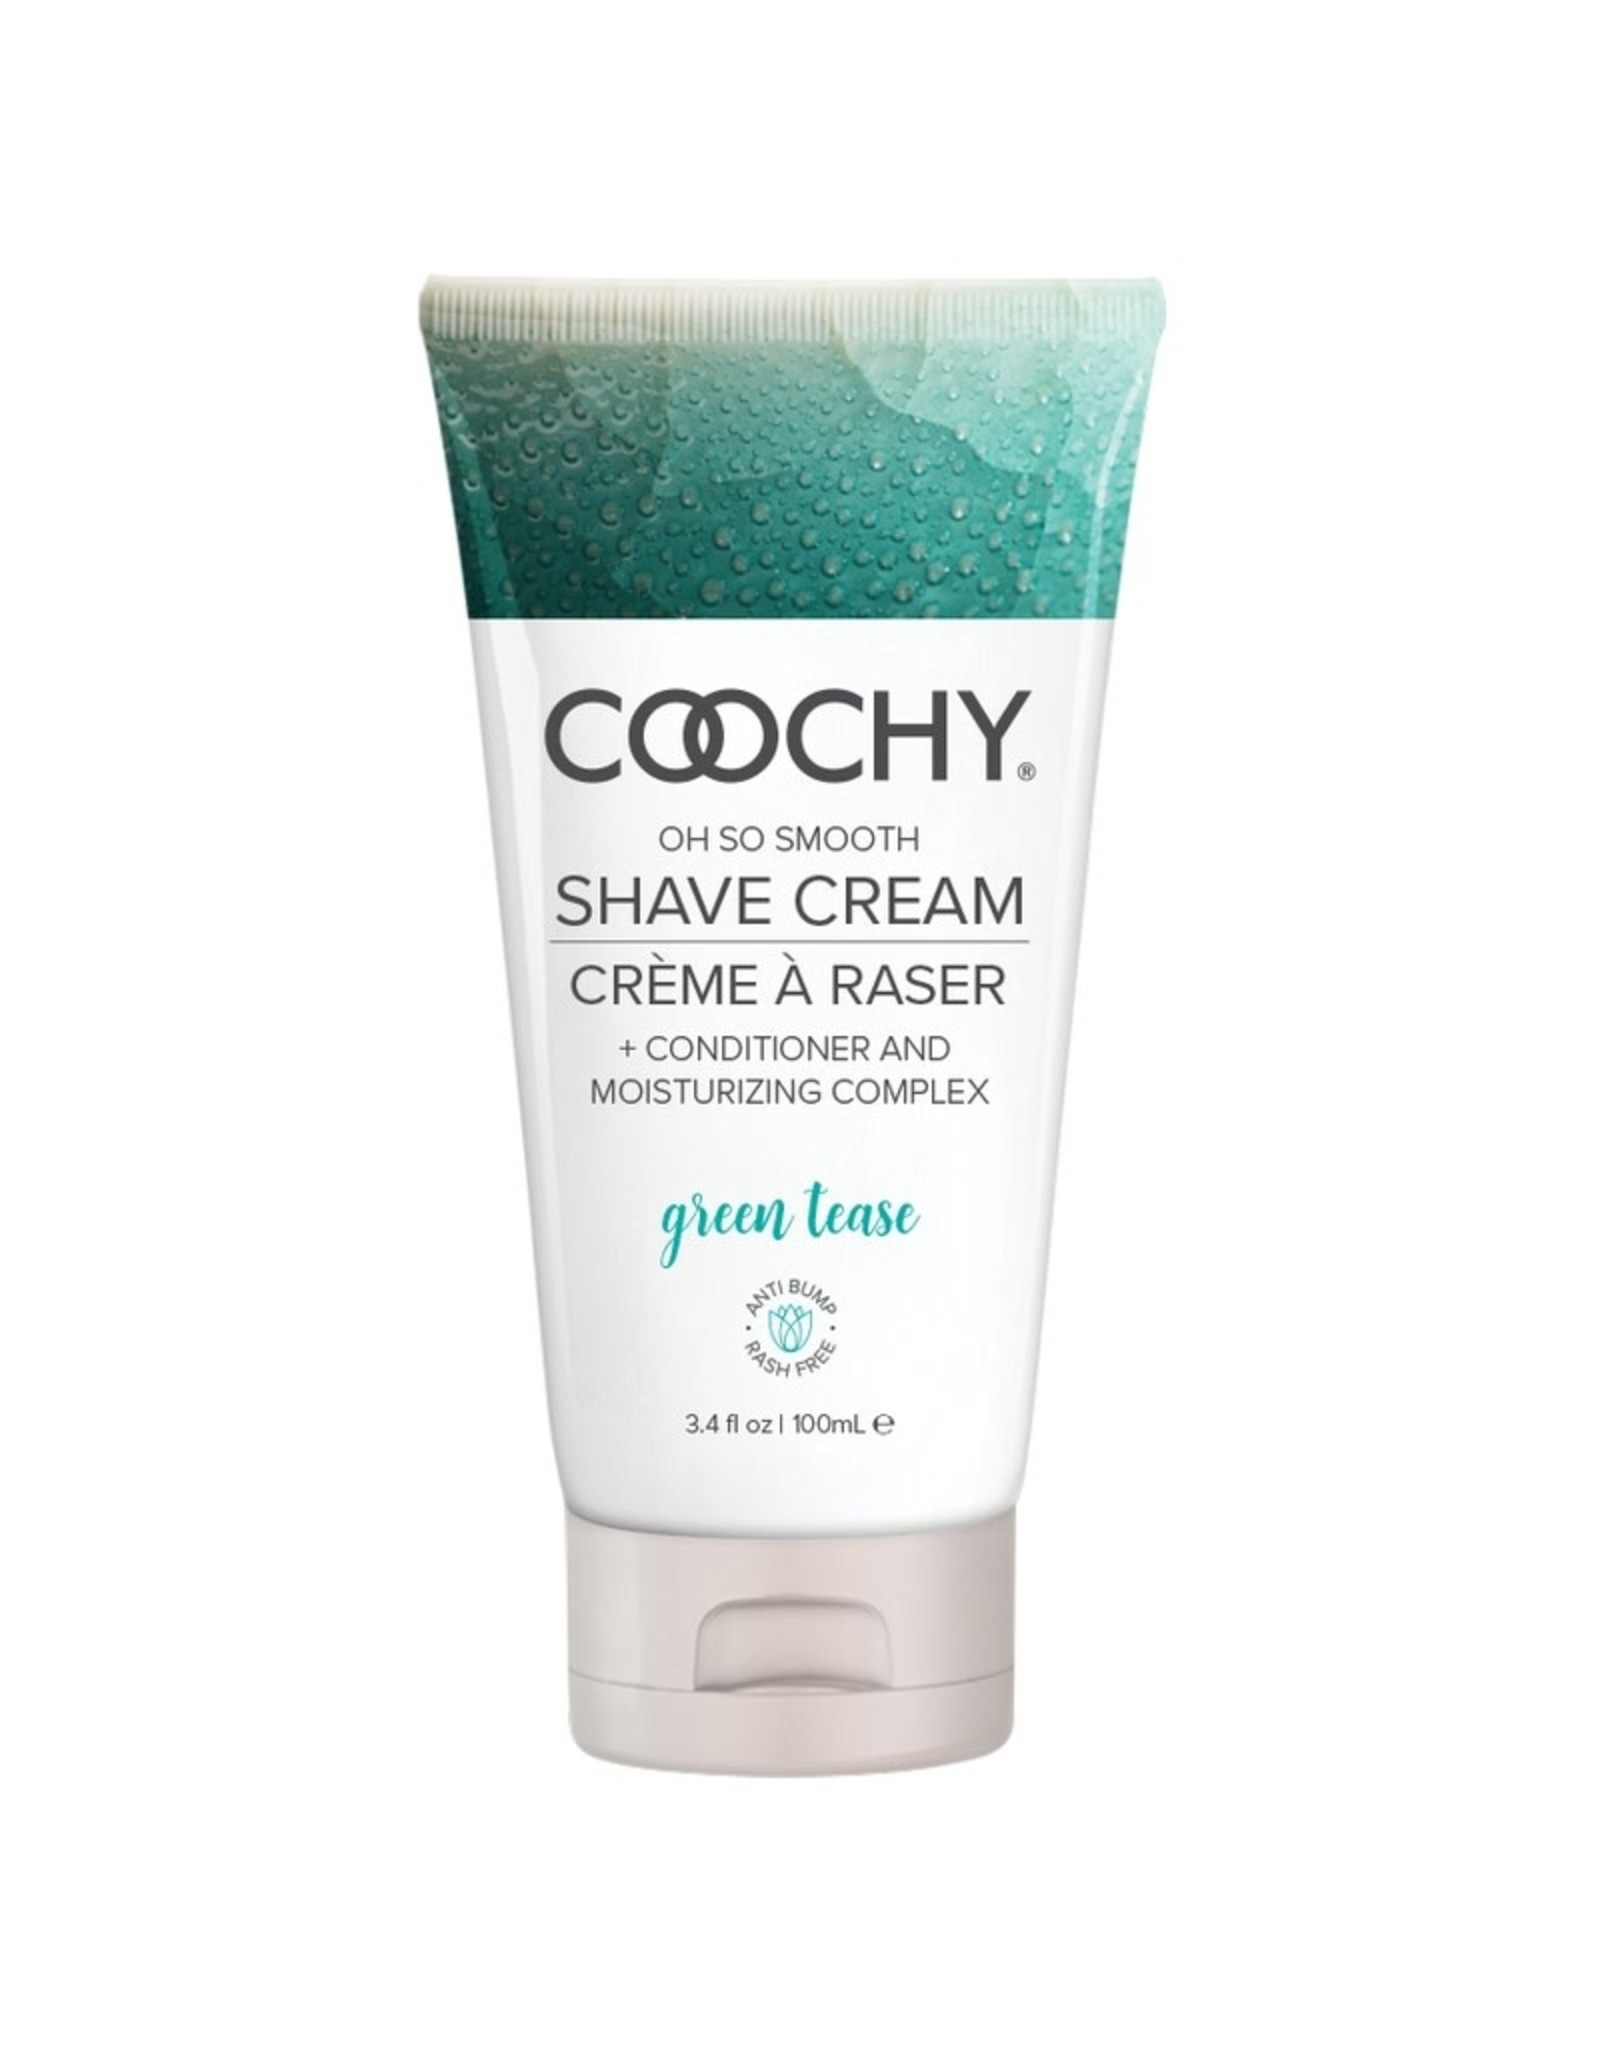 Classic Brands Coochy - Green Tease - 3.4 oz